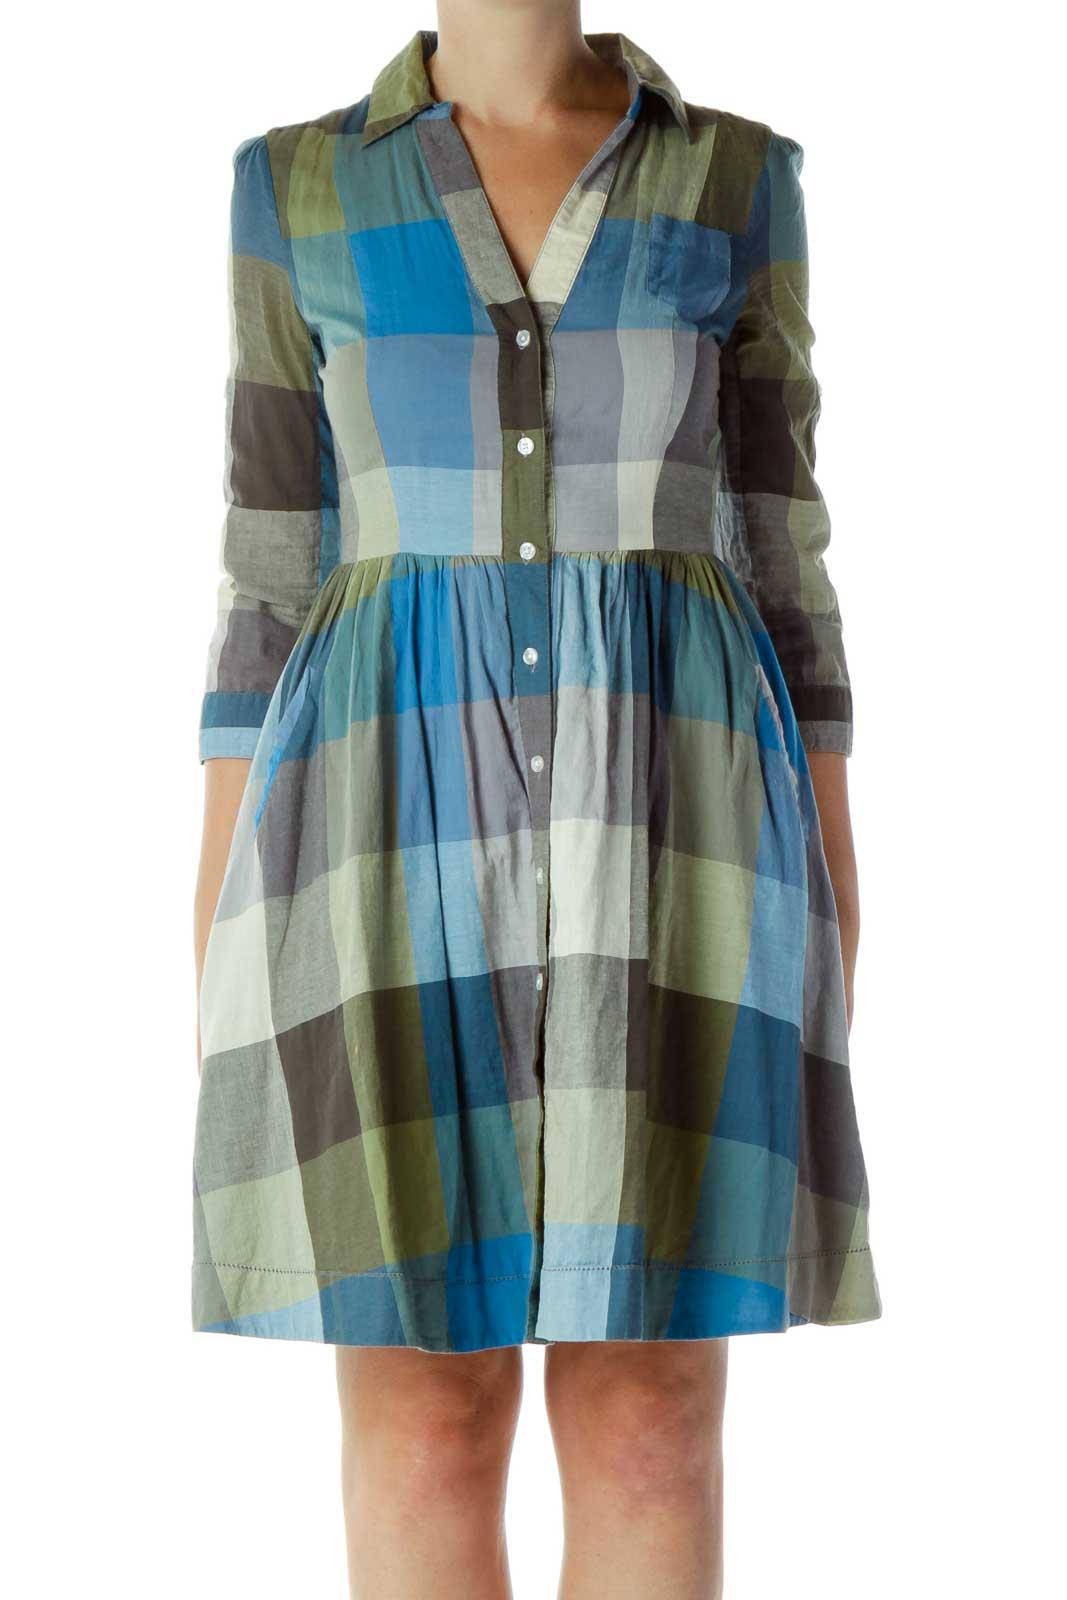 Blue & Green Gingham Dress Front